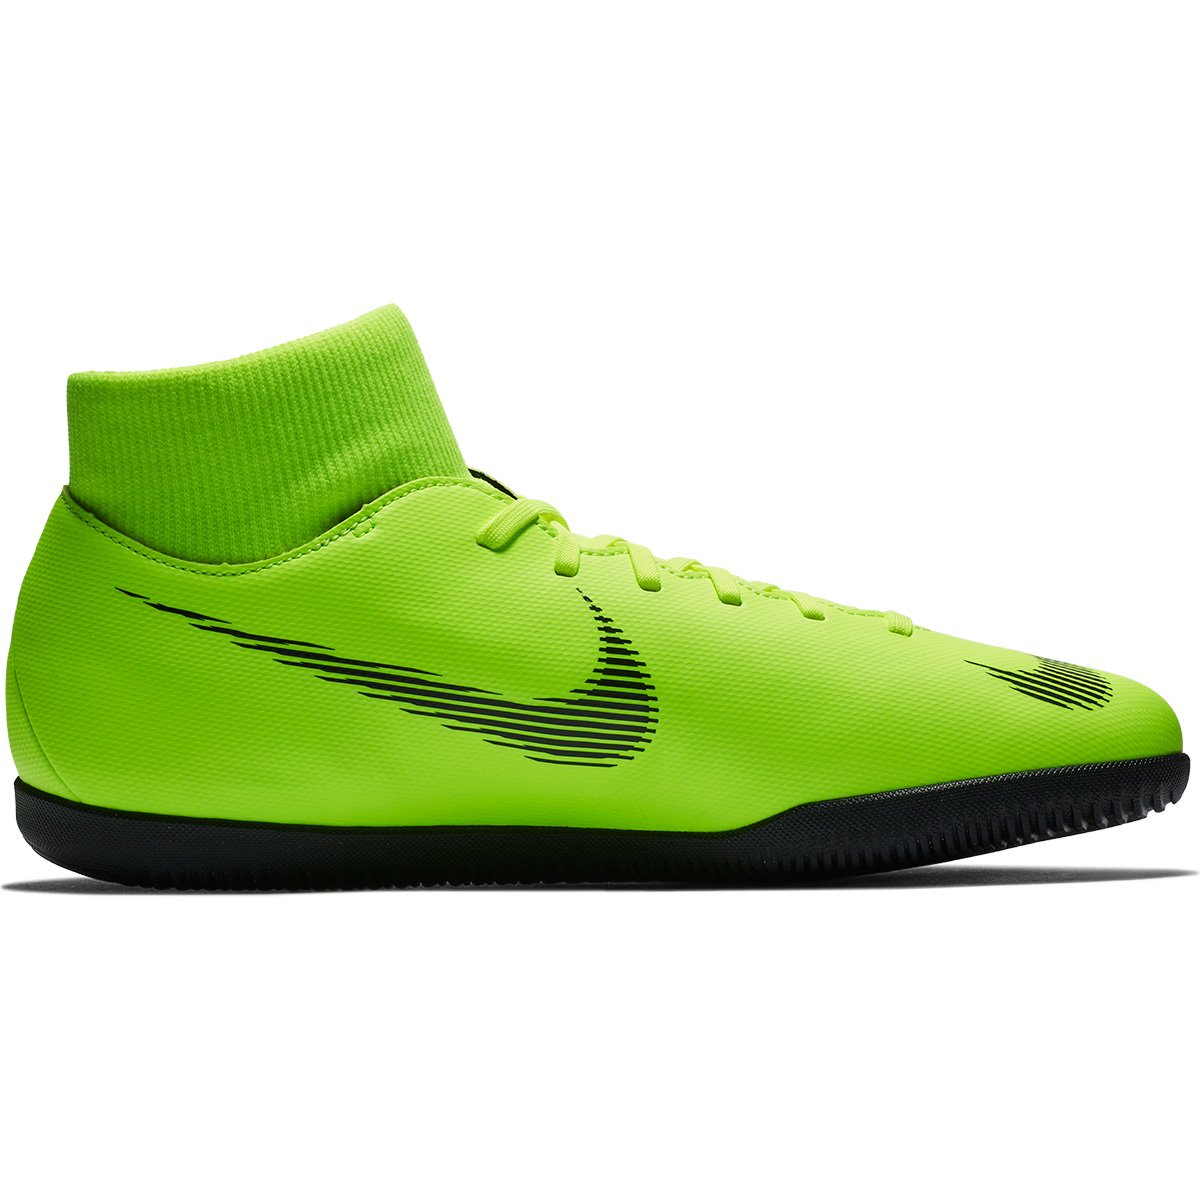 Chuteira Futsal Nike Mercurial Superfly 6 Club - Verde e Preto ... 926995001bfcc